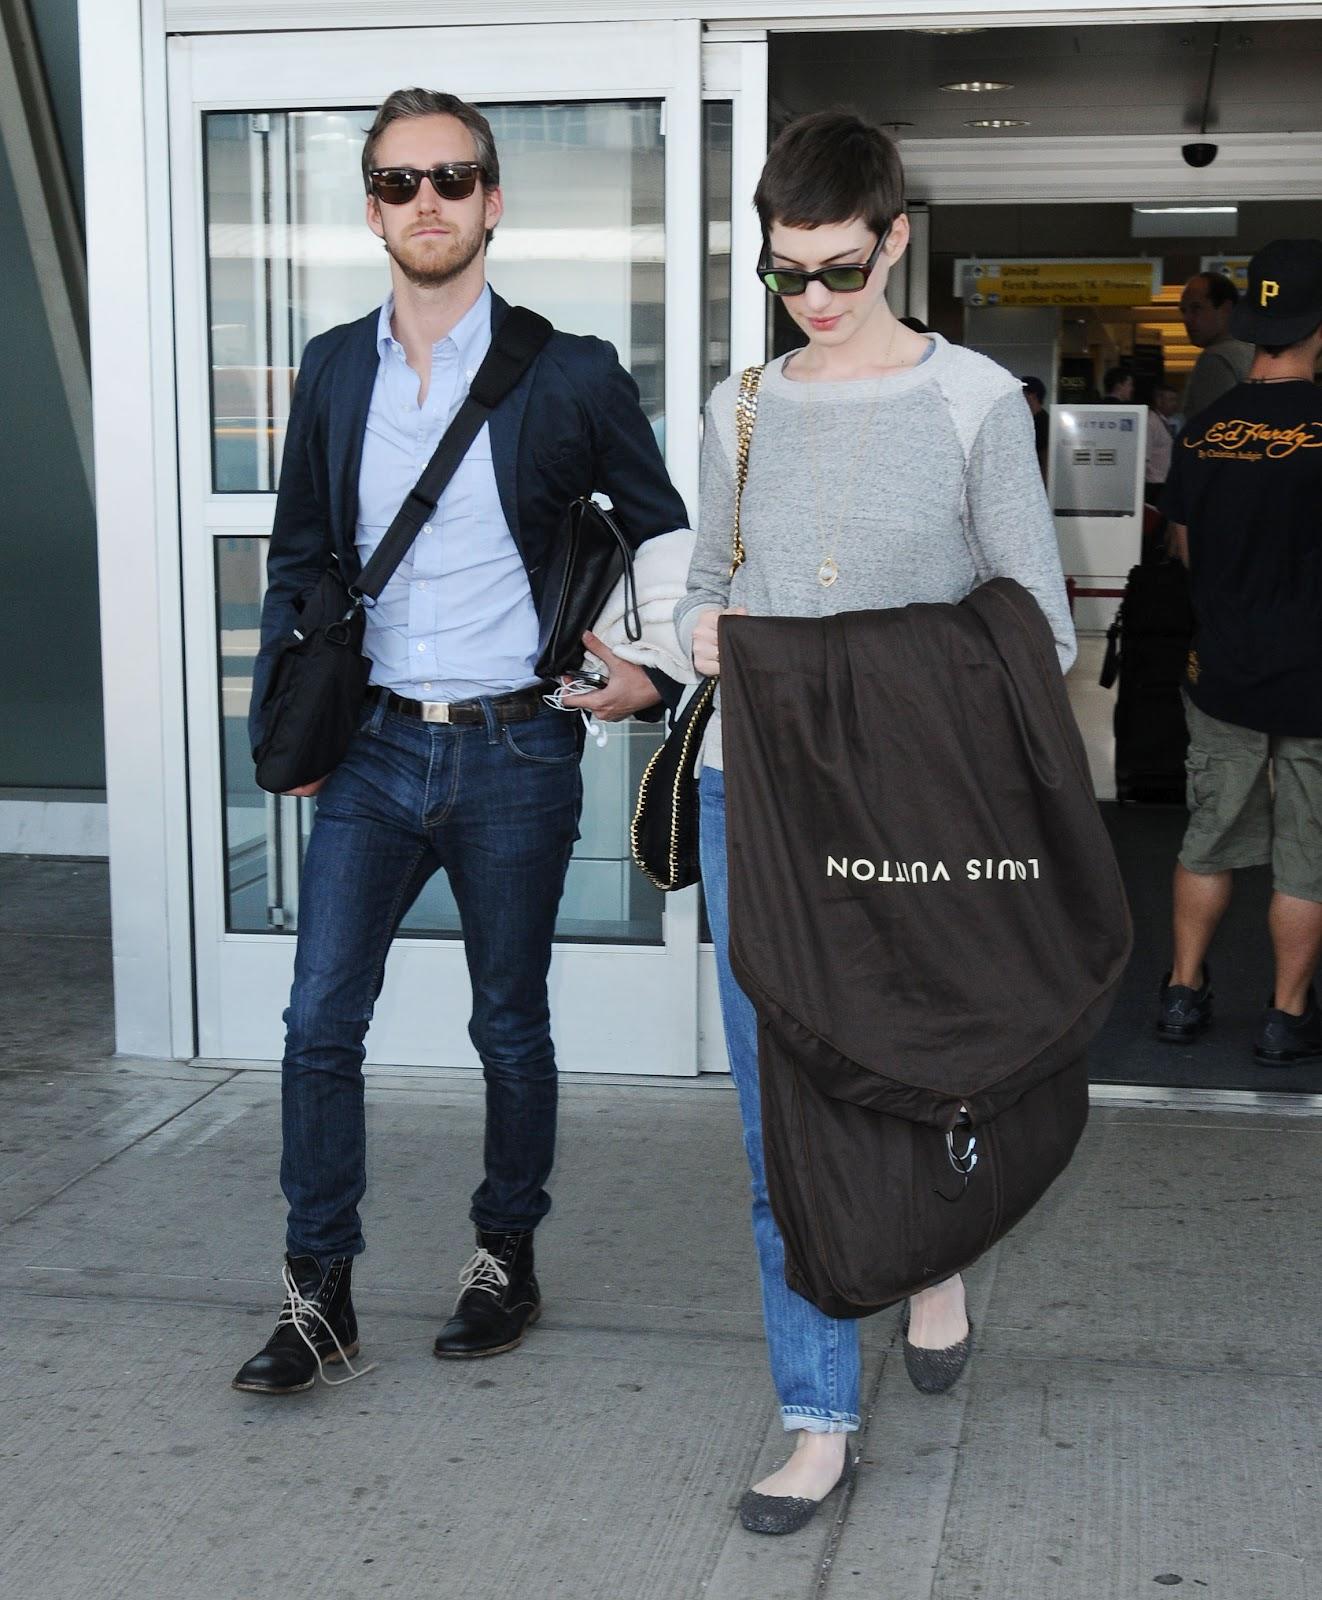 http://4.bp.blogspot.com/-pLfYrnBXiSc/UAG6vs9ALgI/AAAAAAAAK3E/vXcy_TwBIcA/s1600/Anne+Hathaway+Arriving+at+JFK+Airport+July+2012+-04.jpg